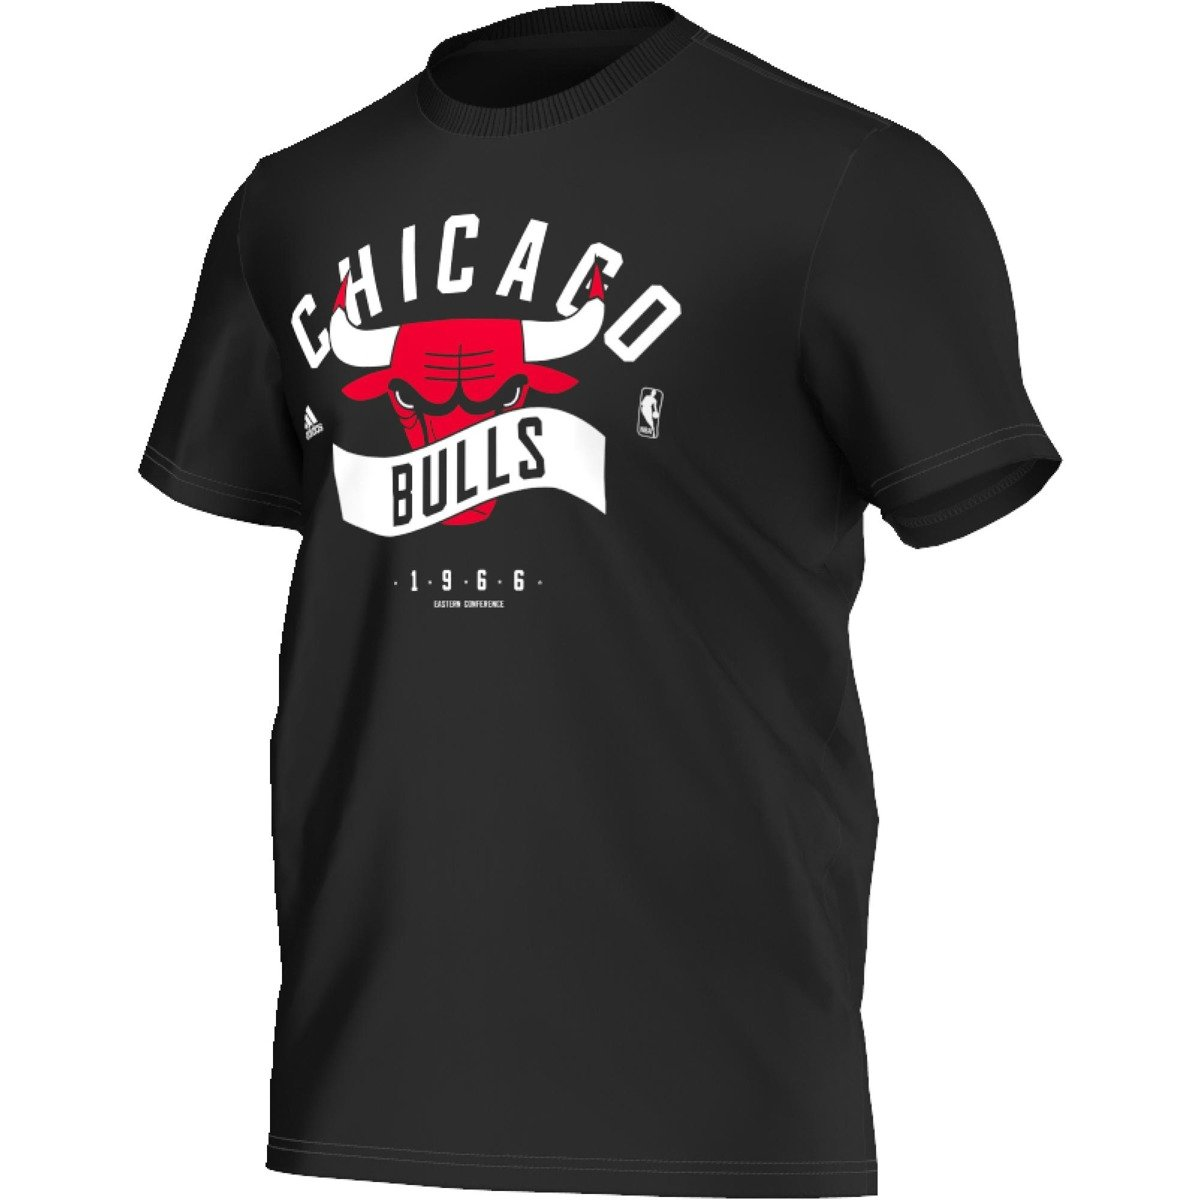 adidas chicago bulls team tee t shirt ah5069. Black Bedroom Furniture Sets. Home Design Ideas